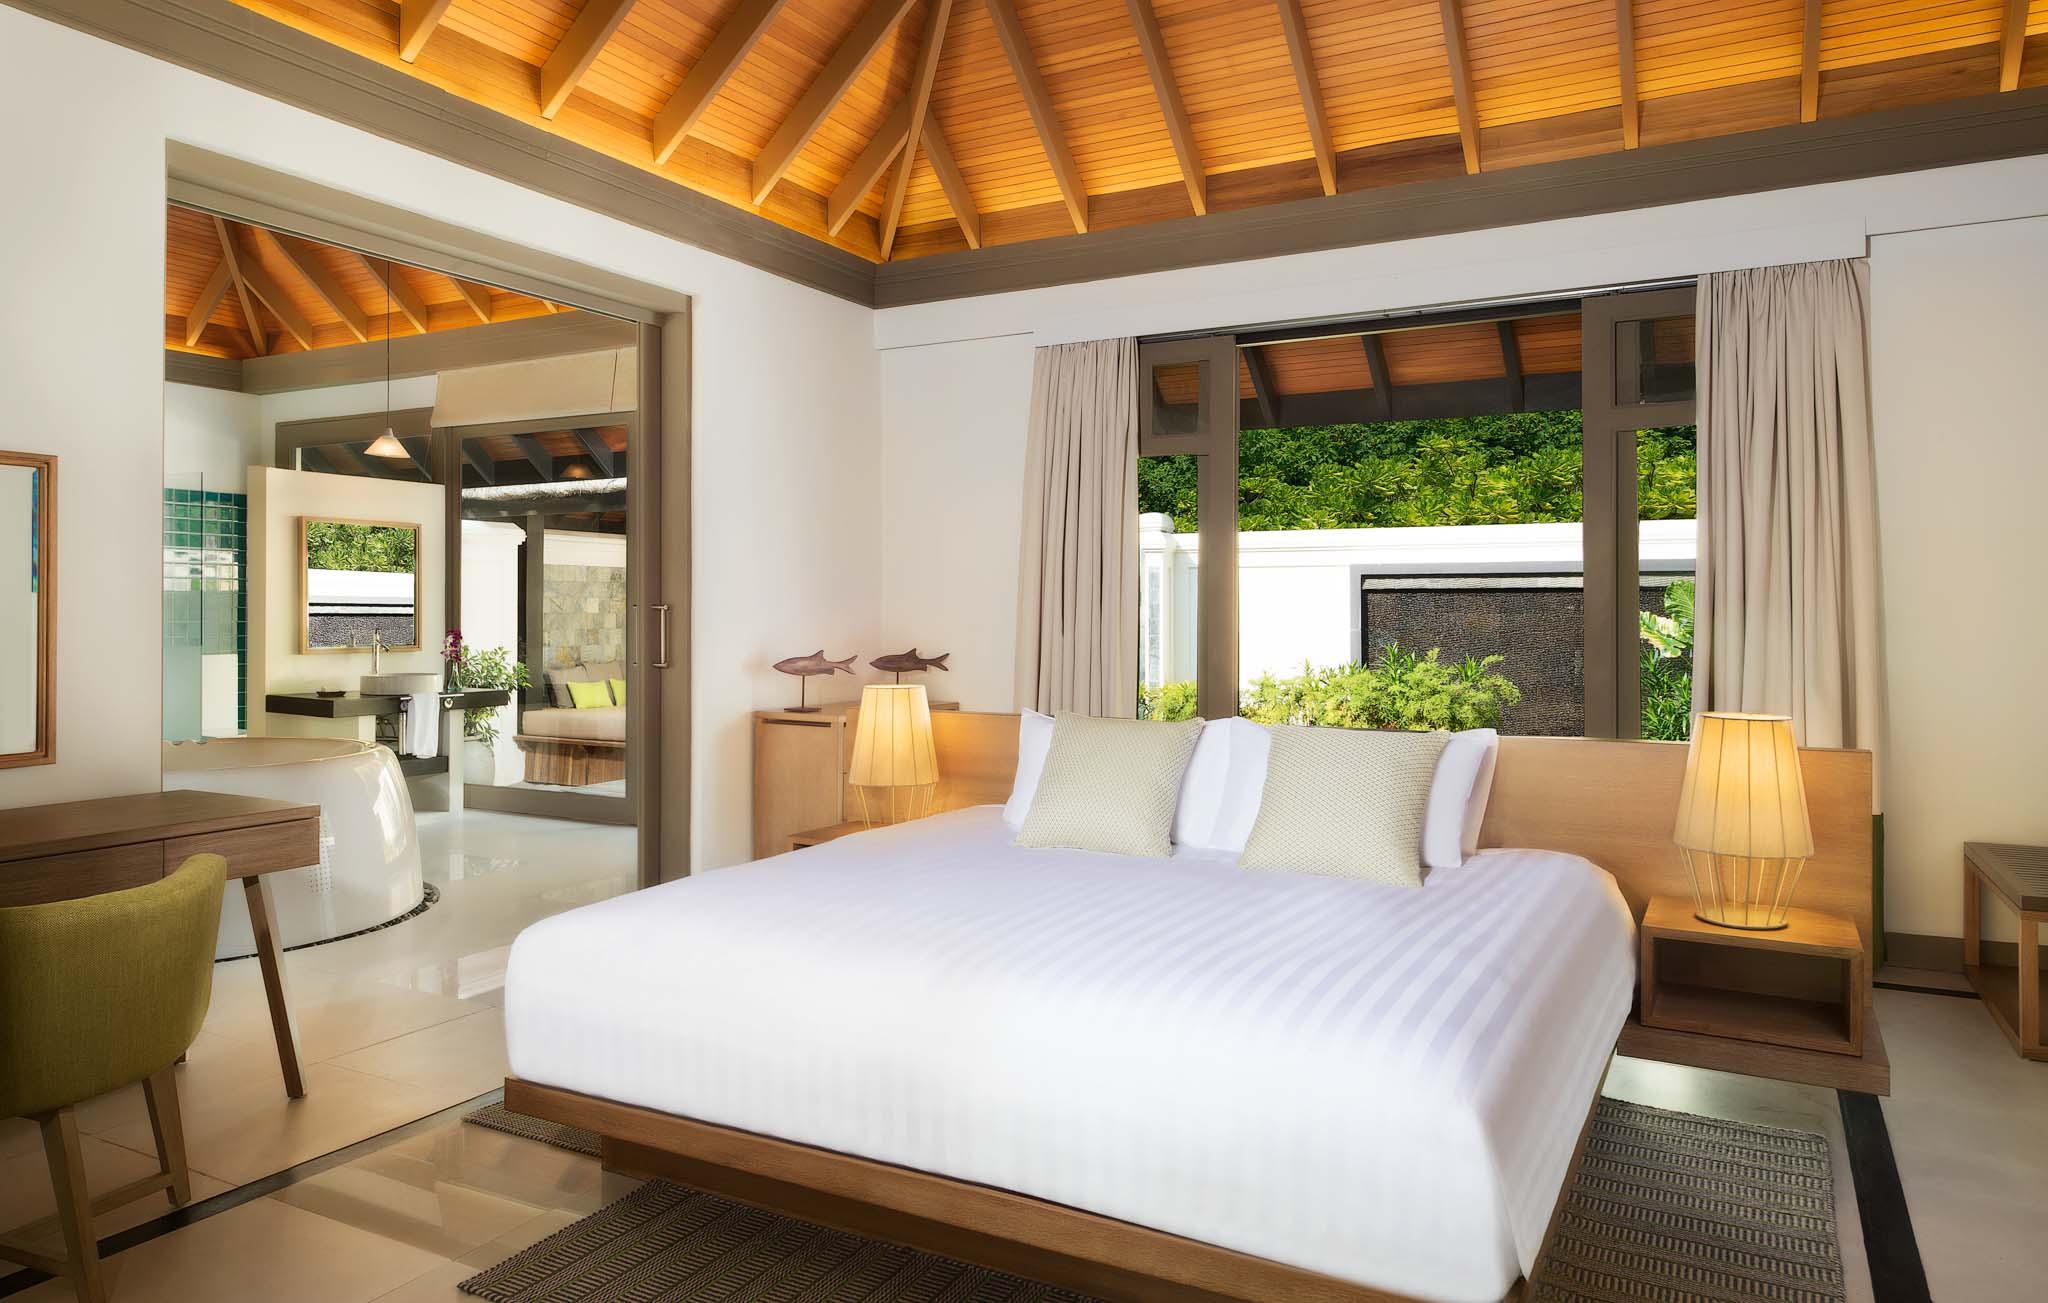 Hotel Photographer - Luxury Bedroom Suite In Maldives